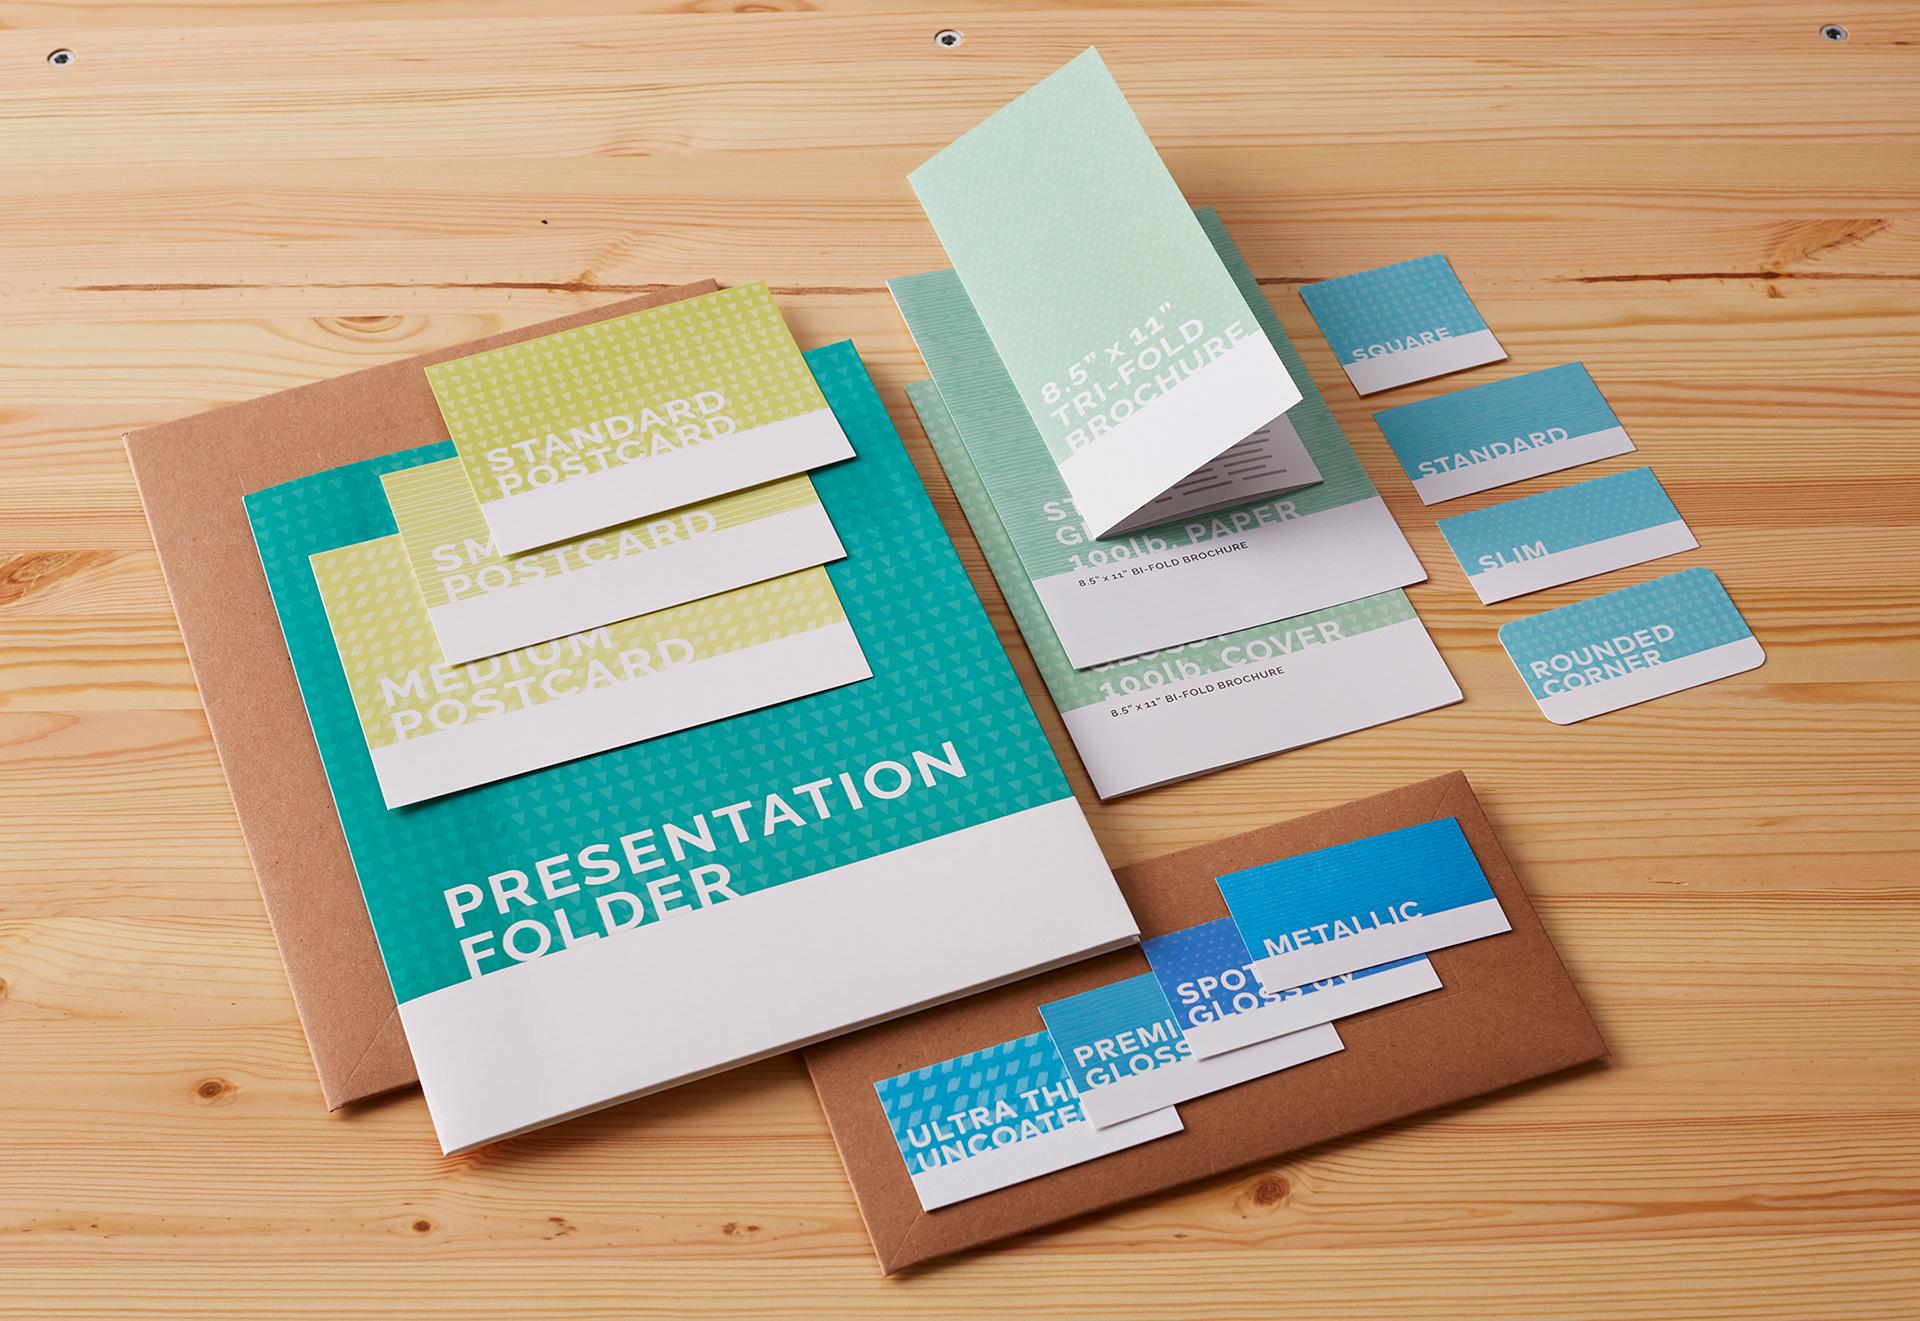 Unique Gallery Of Vistaprint Com Business Cards - Business Cards ...